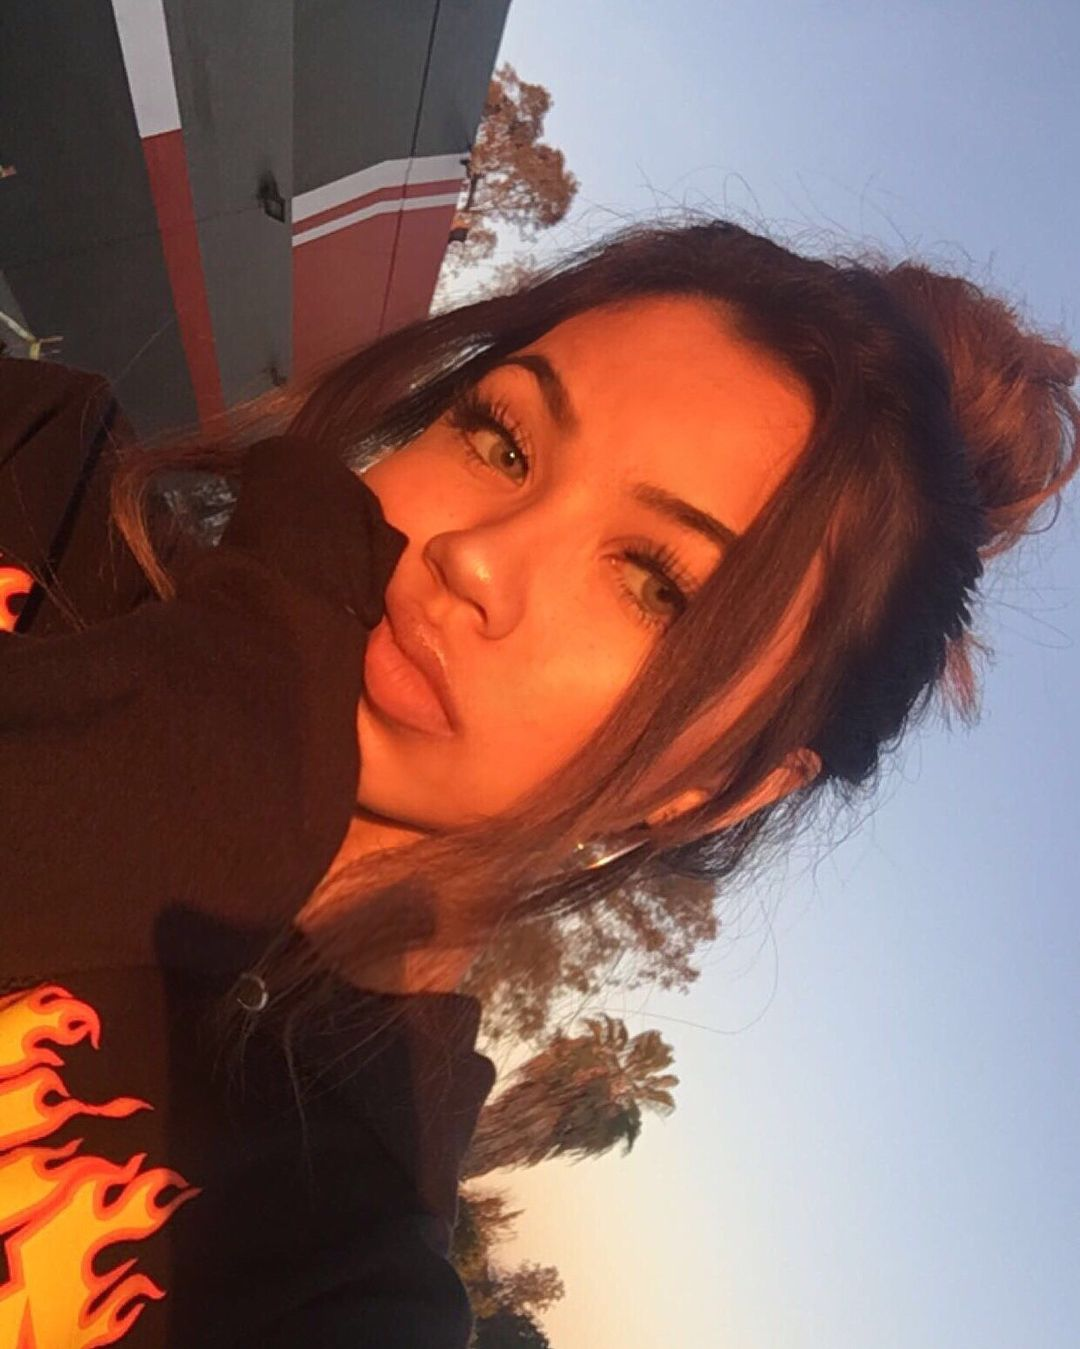 Angelica Dove Https Www Instagram Com Angelica Dove Tumblr Face Cute Selfie Ideas Selfies Poses 8 otvetov 9 retvitov 17 otmetok «nravitsya». angelica dove https www instagram com